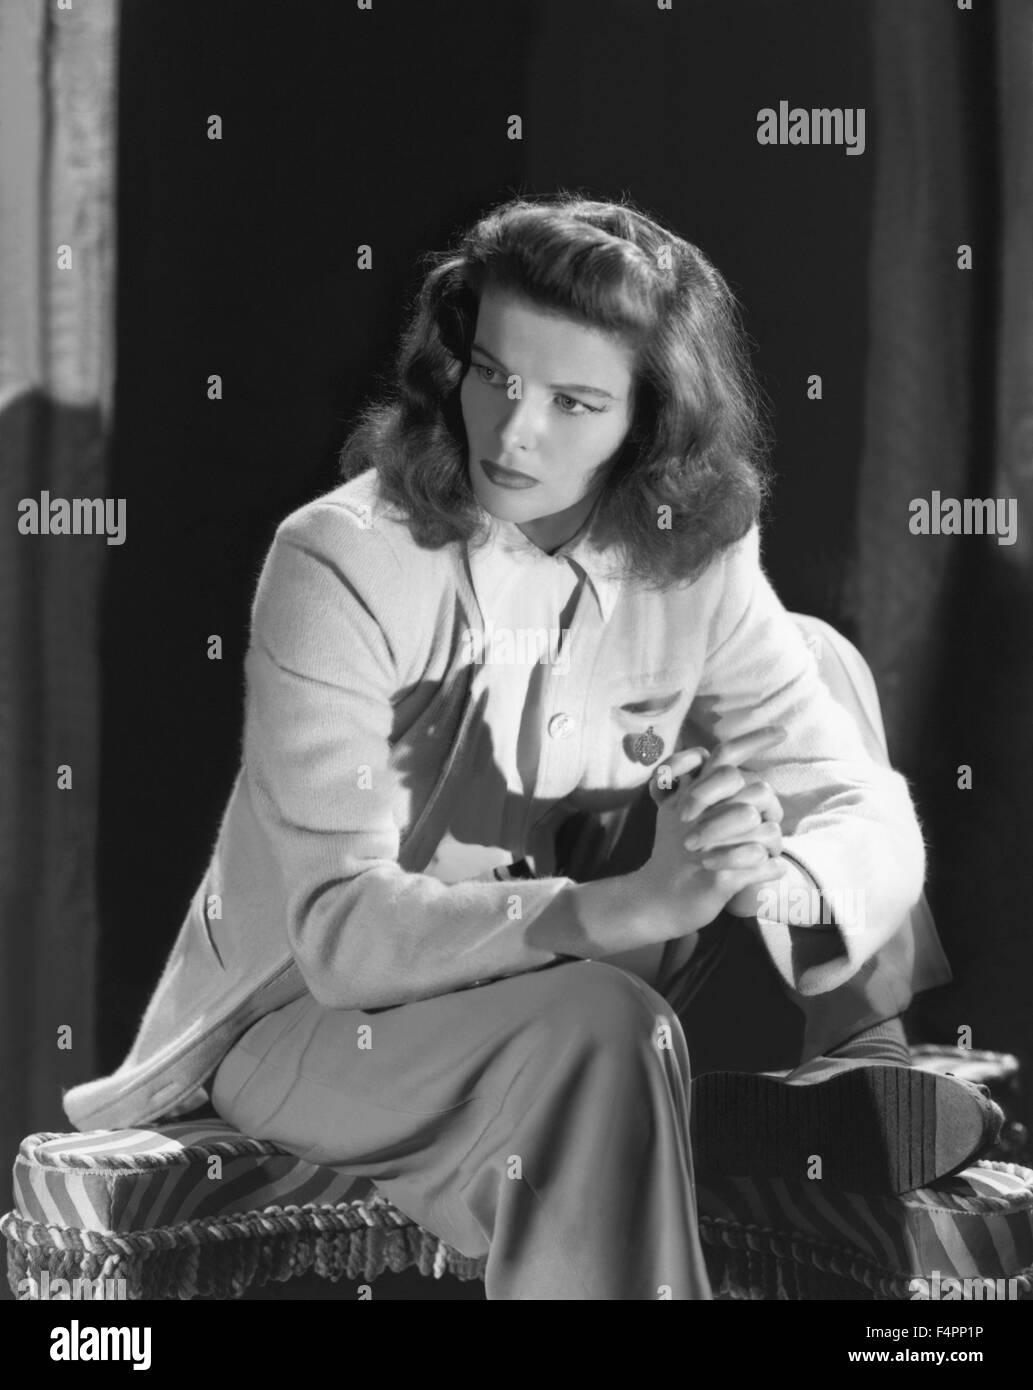 Katharine Hepburn in the 40's  [Metro-Goldwyn-Mayer Pictures] - Stock Image